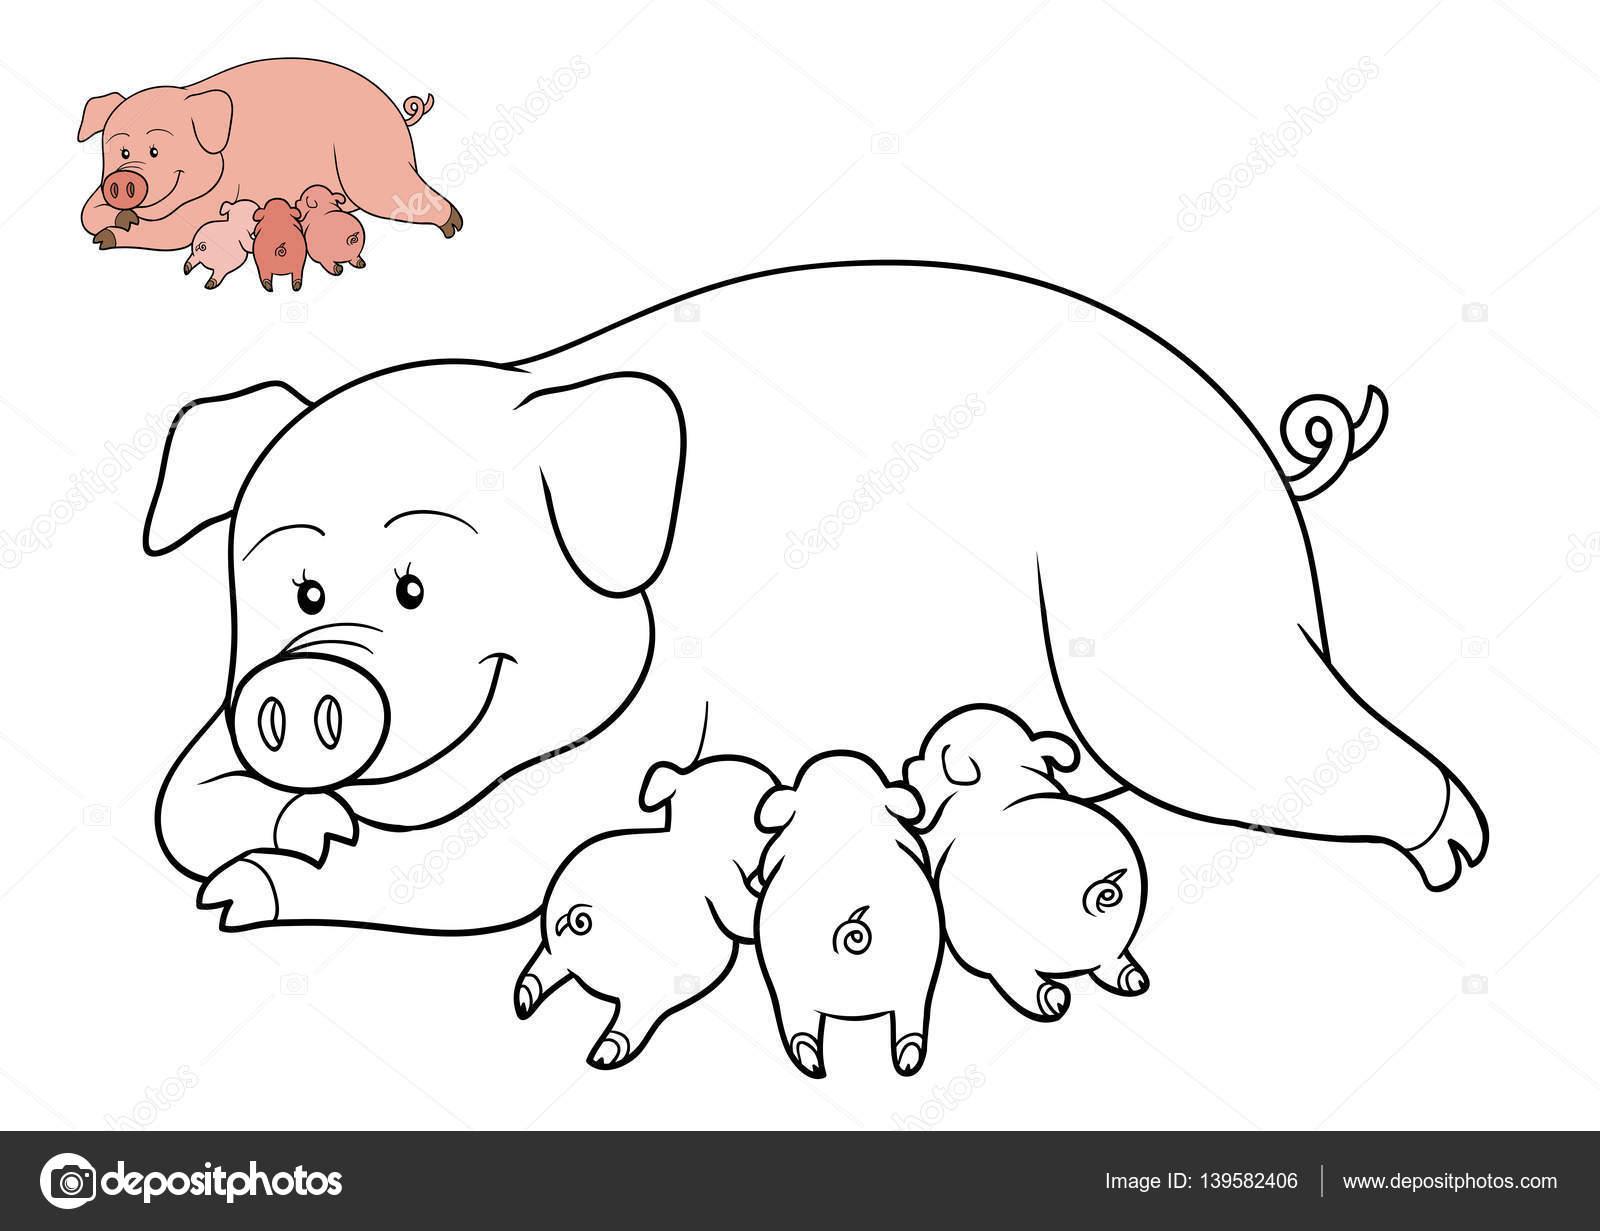 Coloring book, Pig — Stock Photo © ksenya_savva #139582406